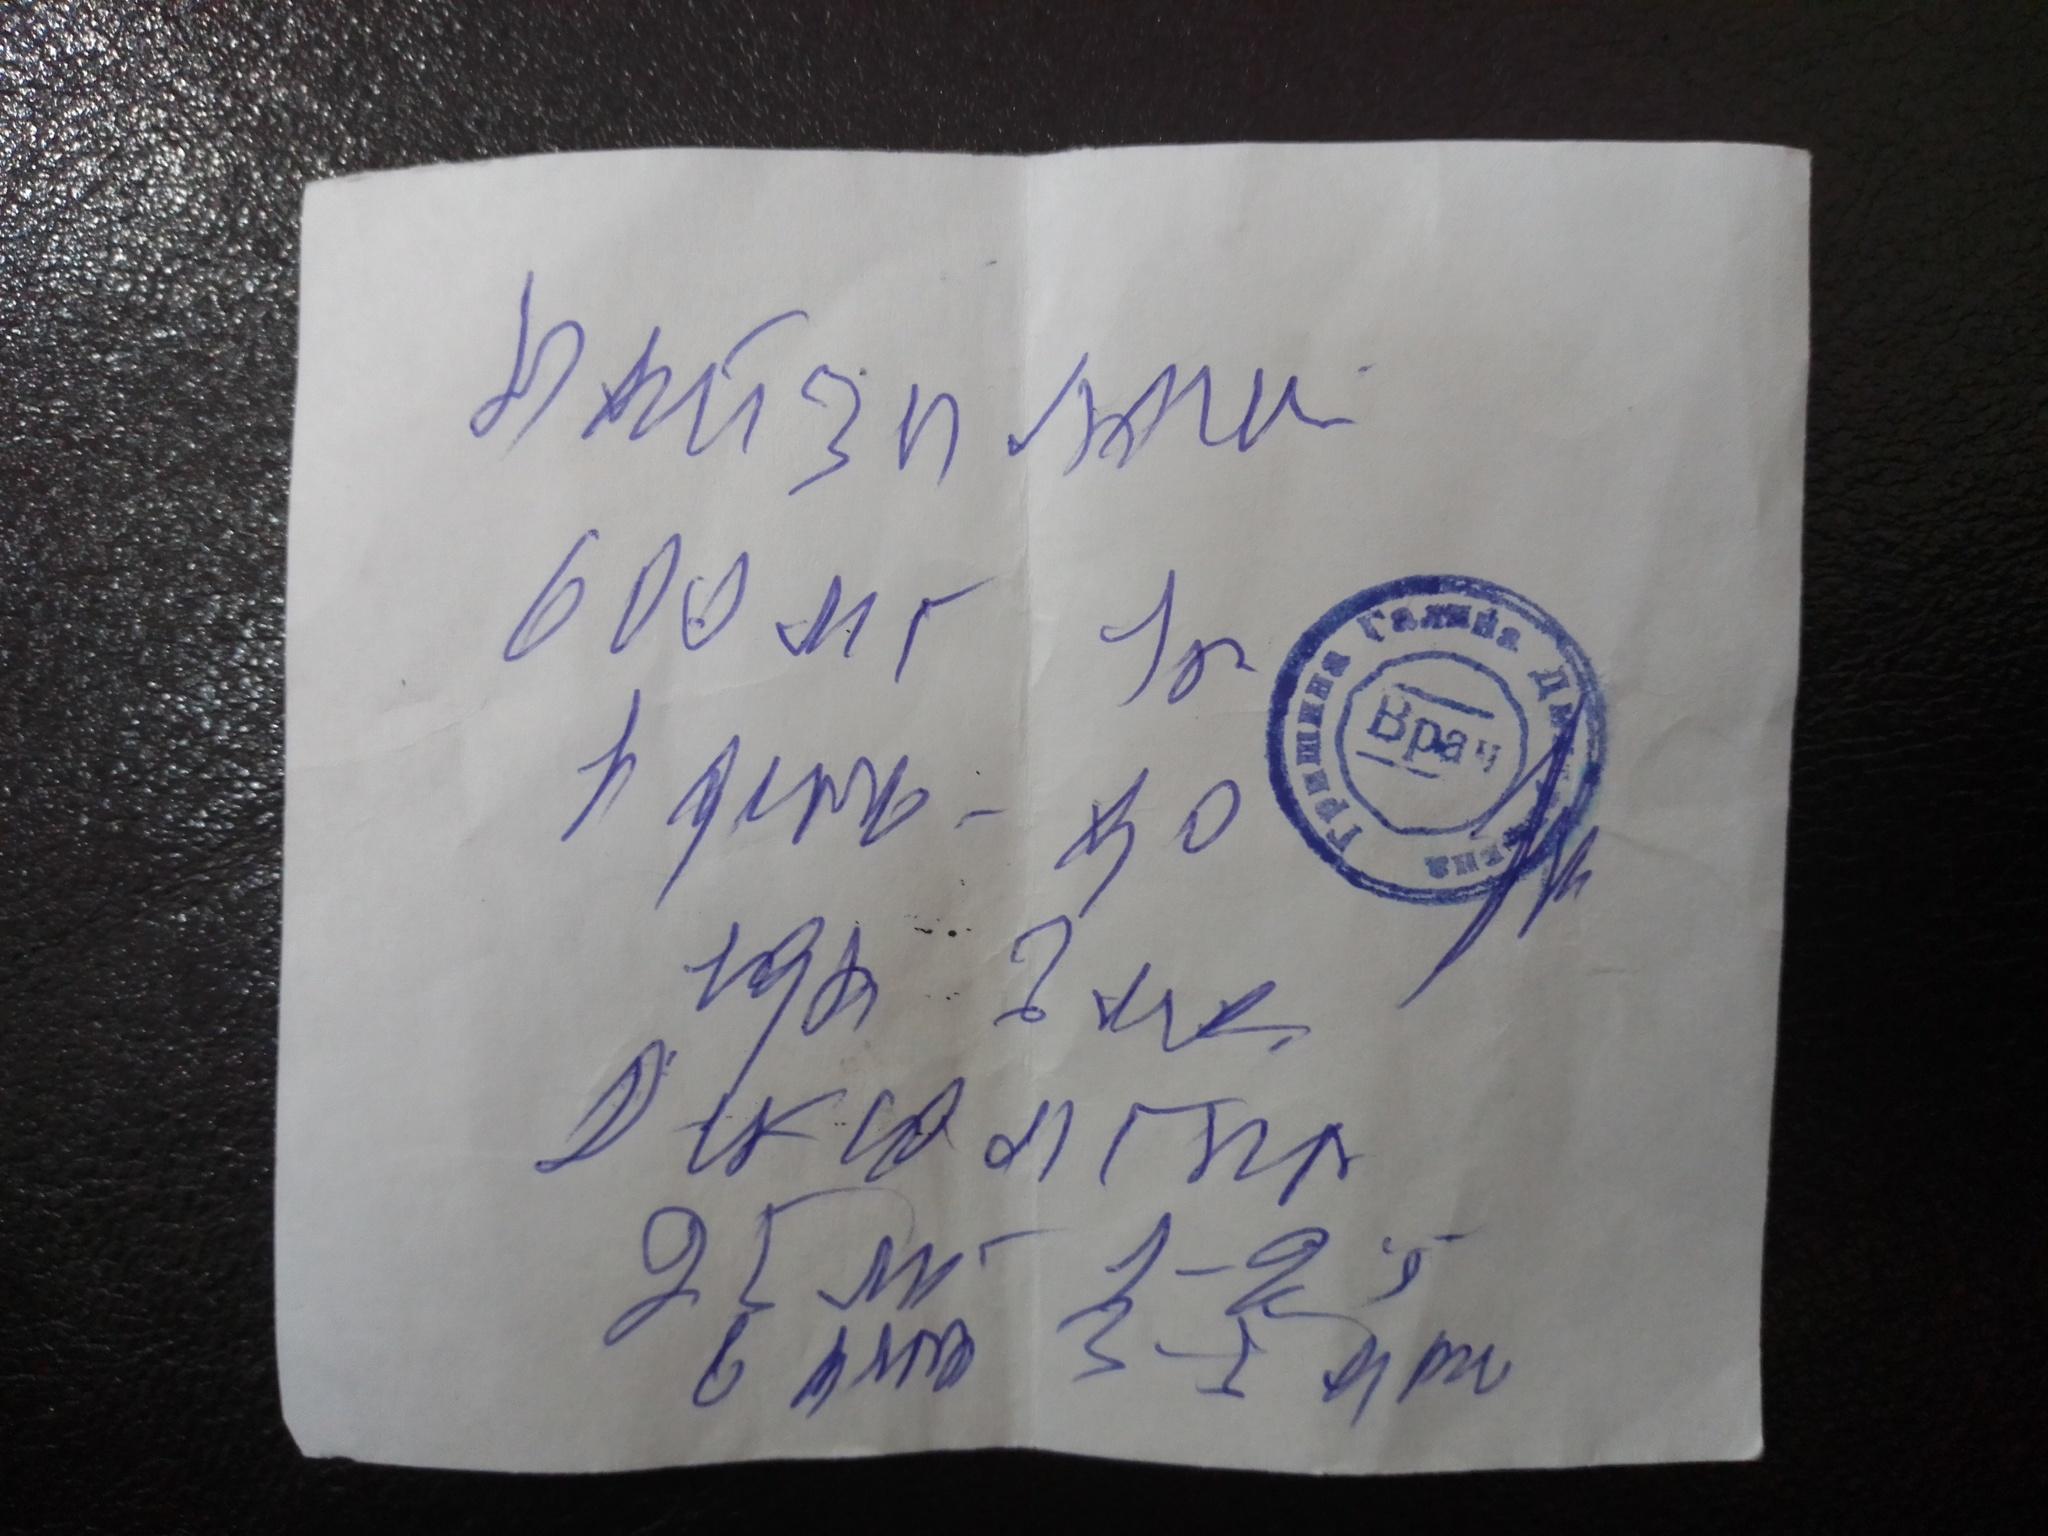 https://cs12.pikabu.ru/post_img/big/2021/06/10/8/162333182818371907.jpg